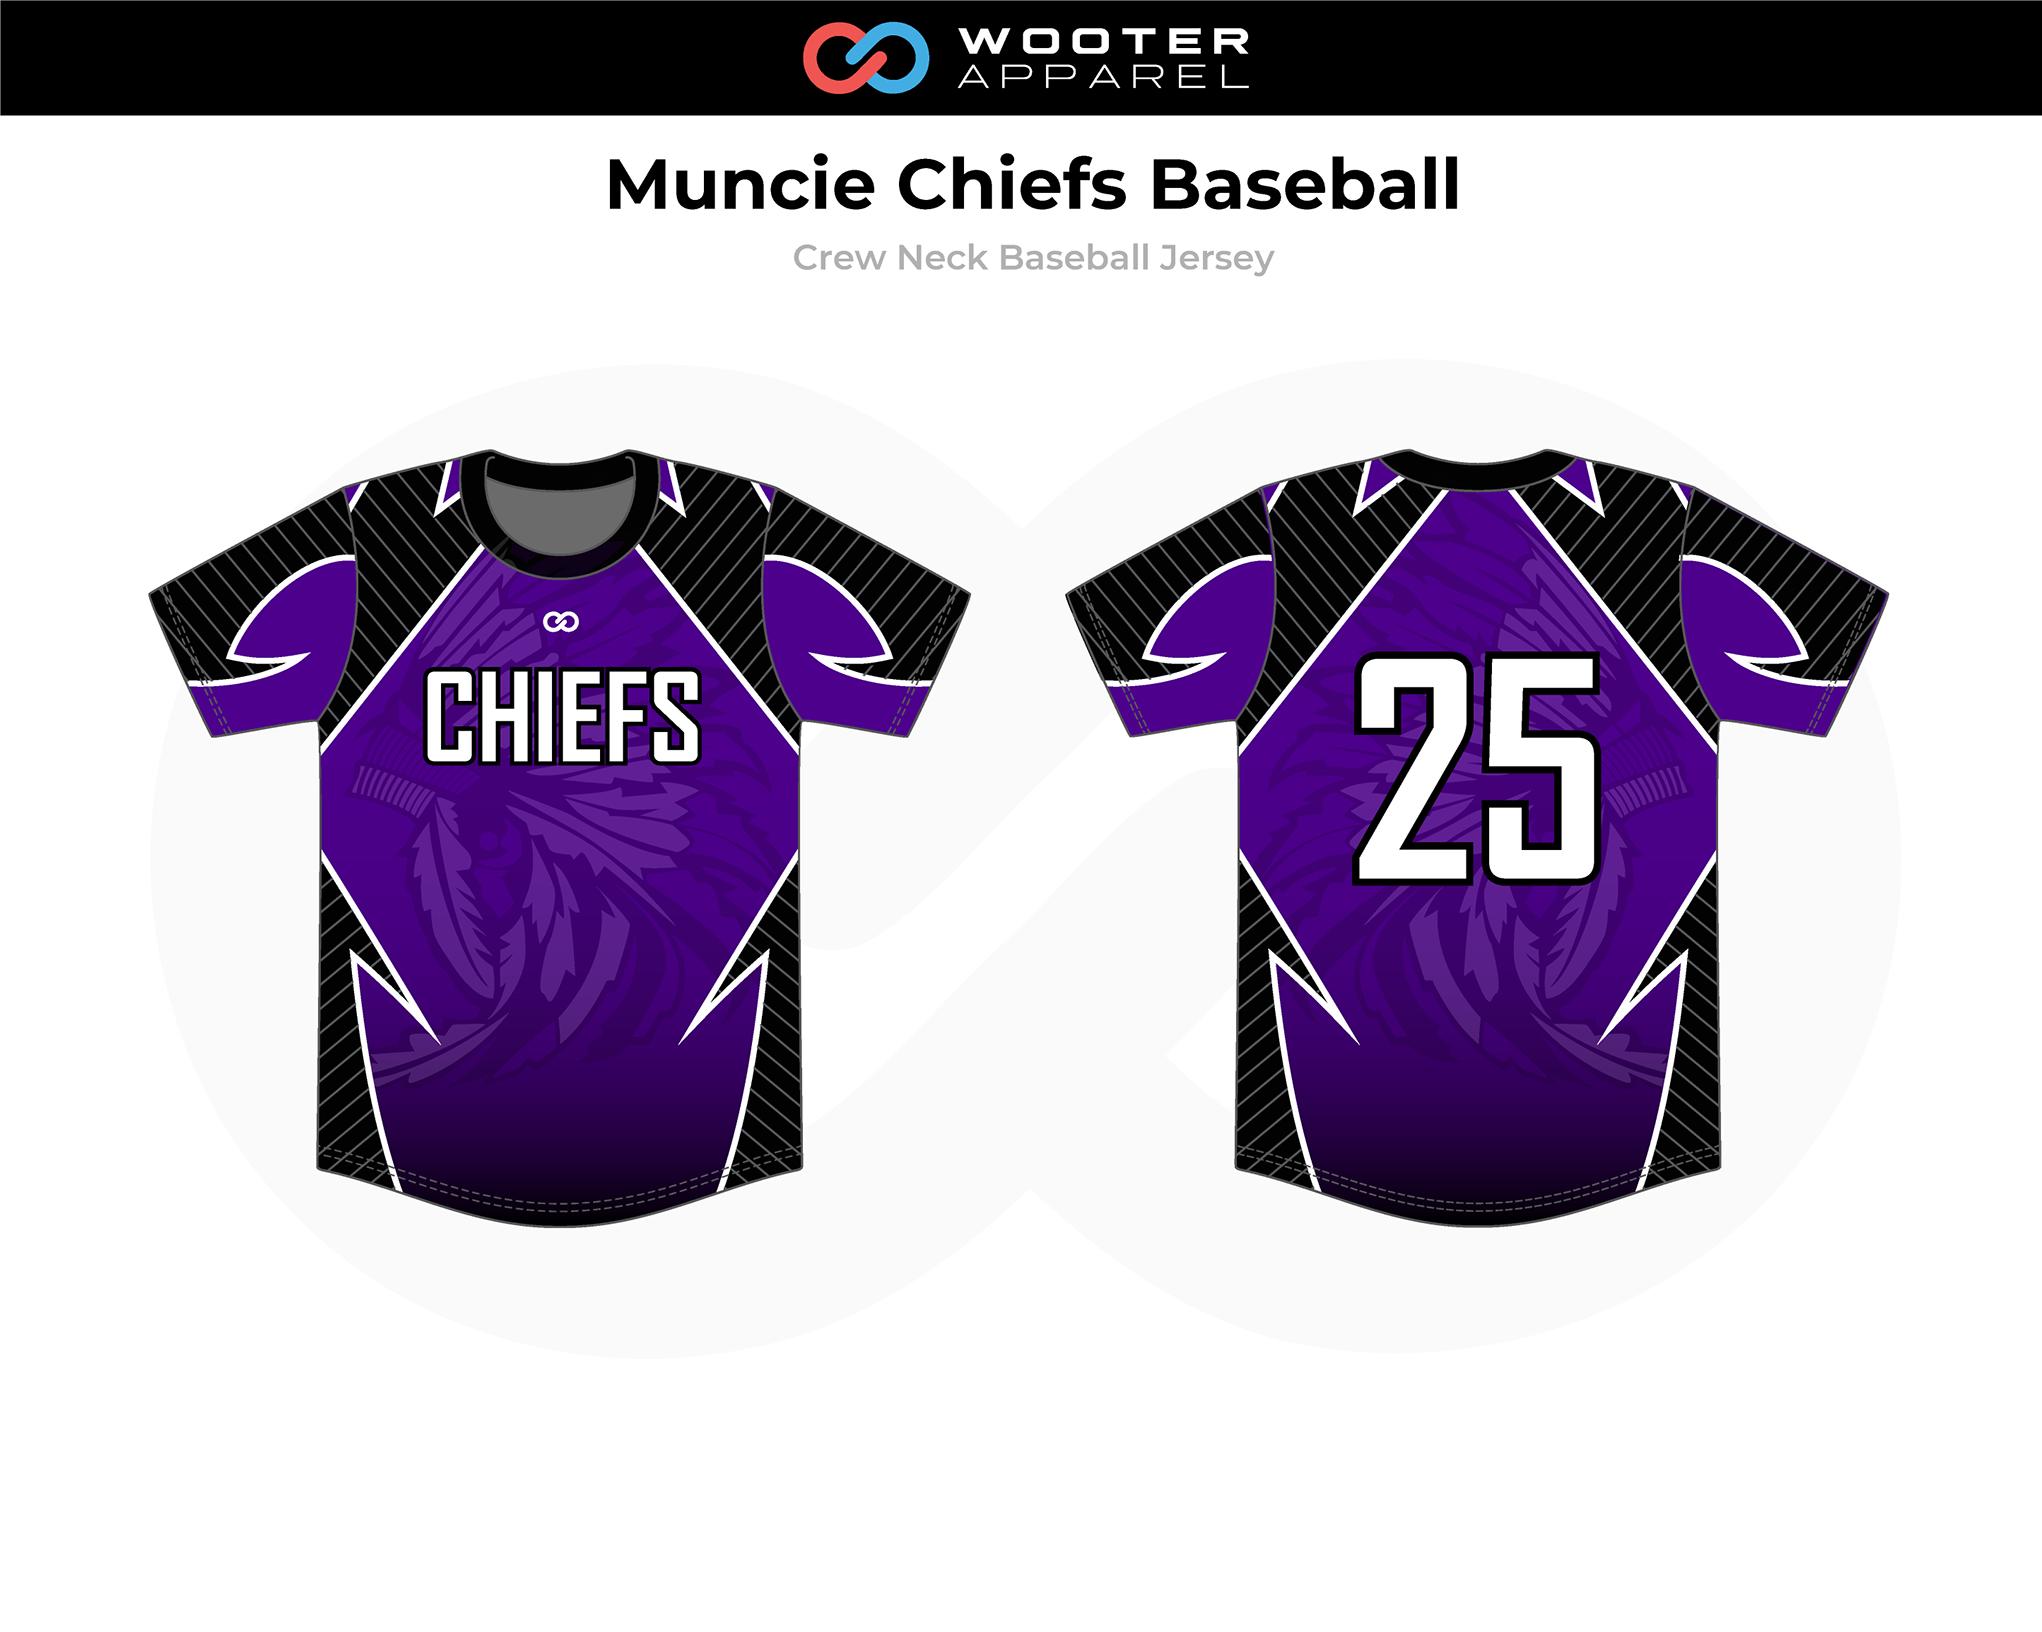 MUNCIE CHIEFS Lavender Black White Crew Neck Baseball Jersey